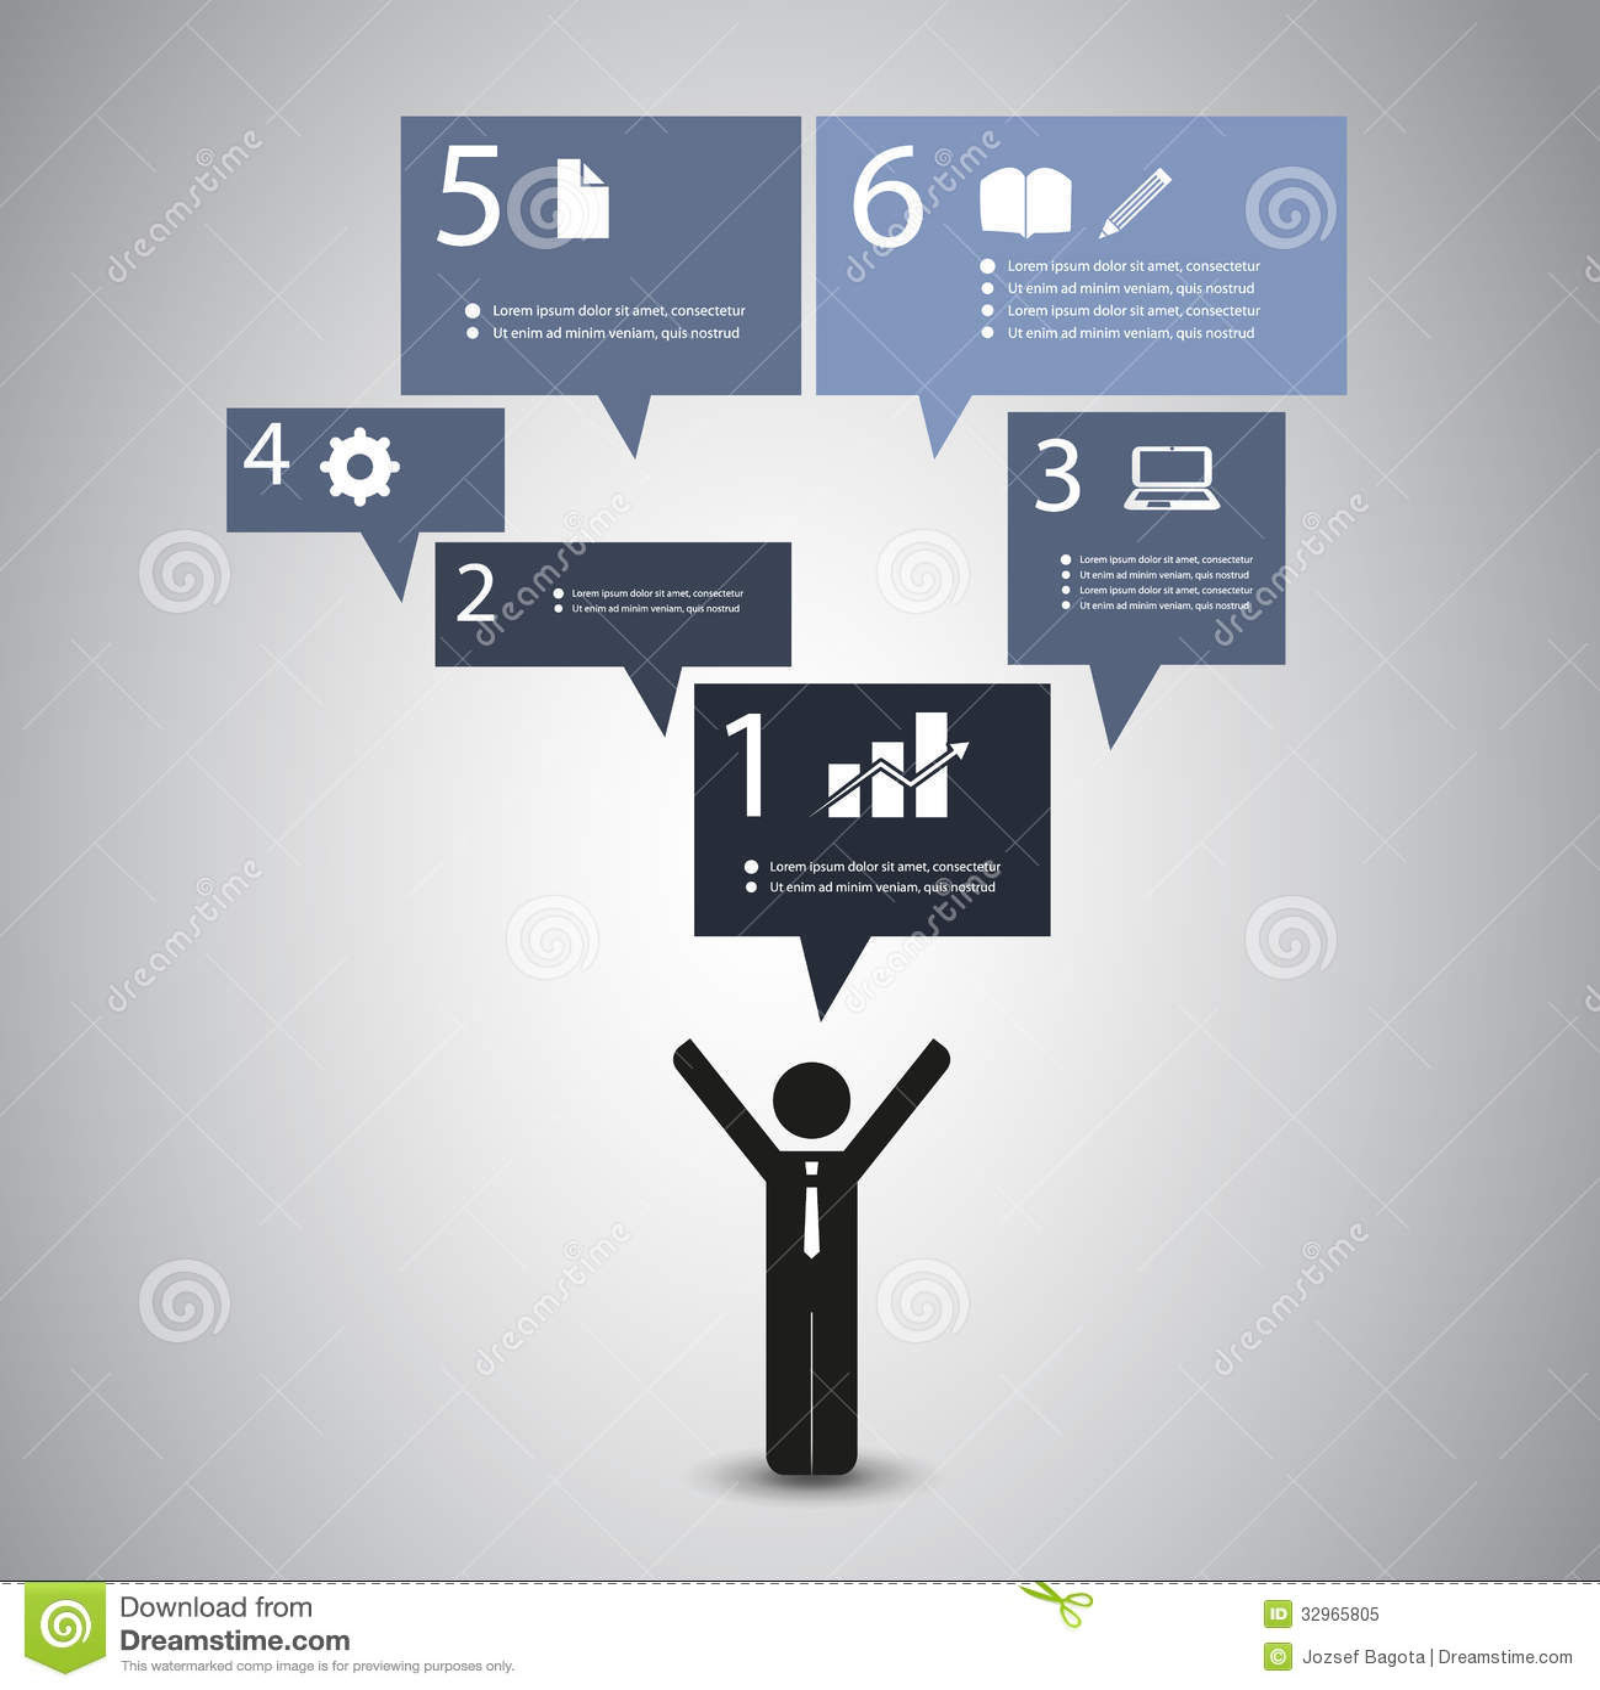 Speech Bubble Concept Royalty Free Stock Photo - Image: 32965805